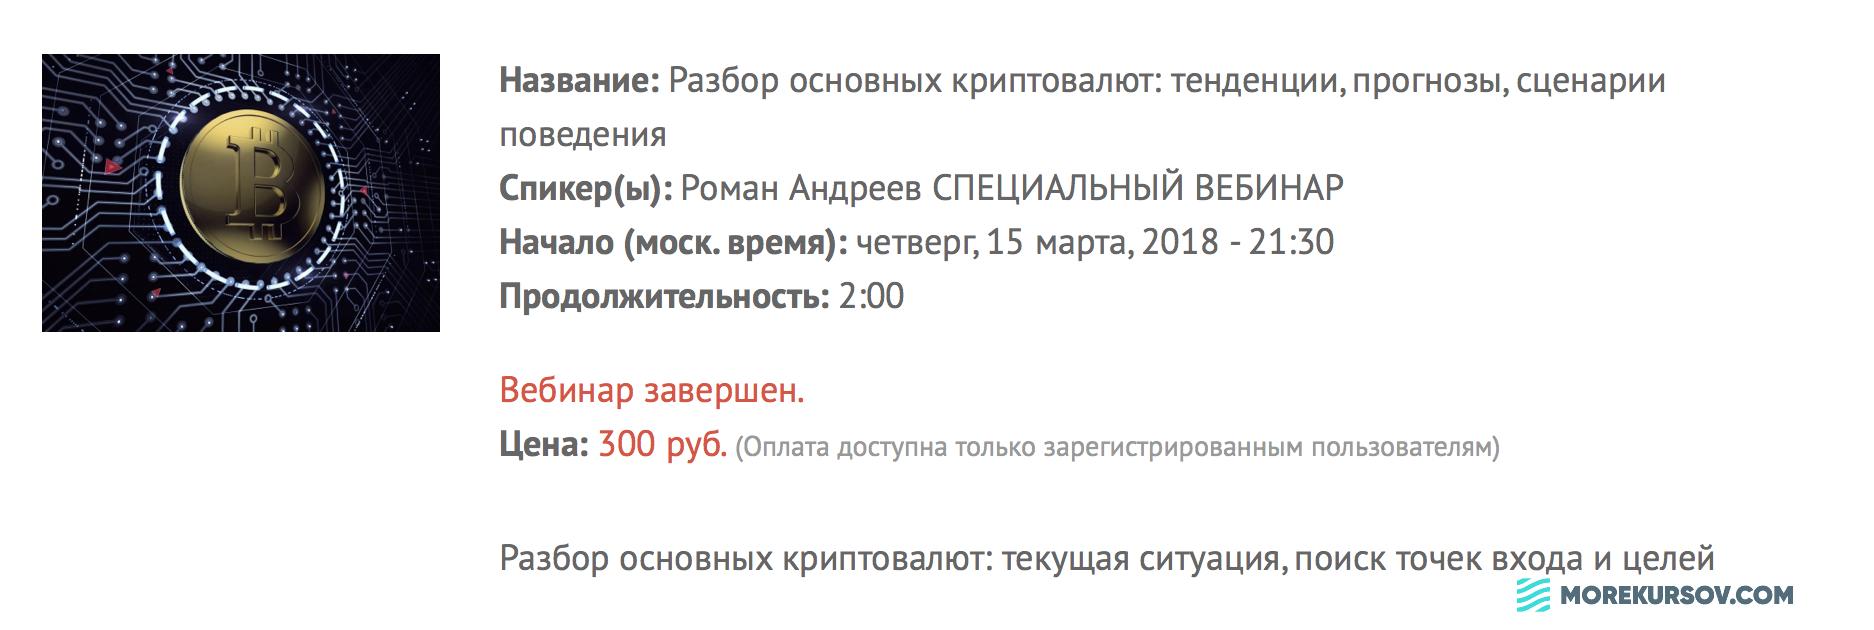 snimok-ehkrana-2018-03-24-v-9-57-43-png.191